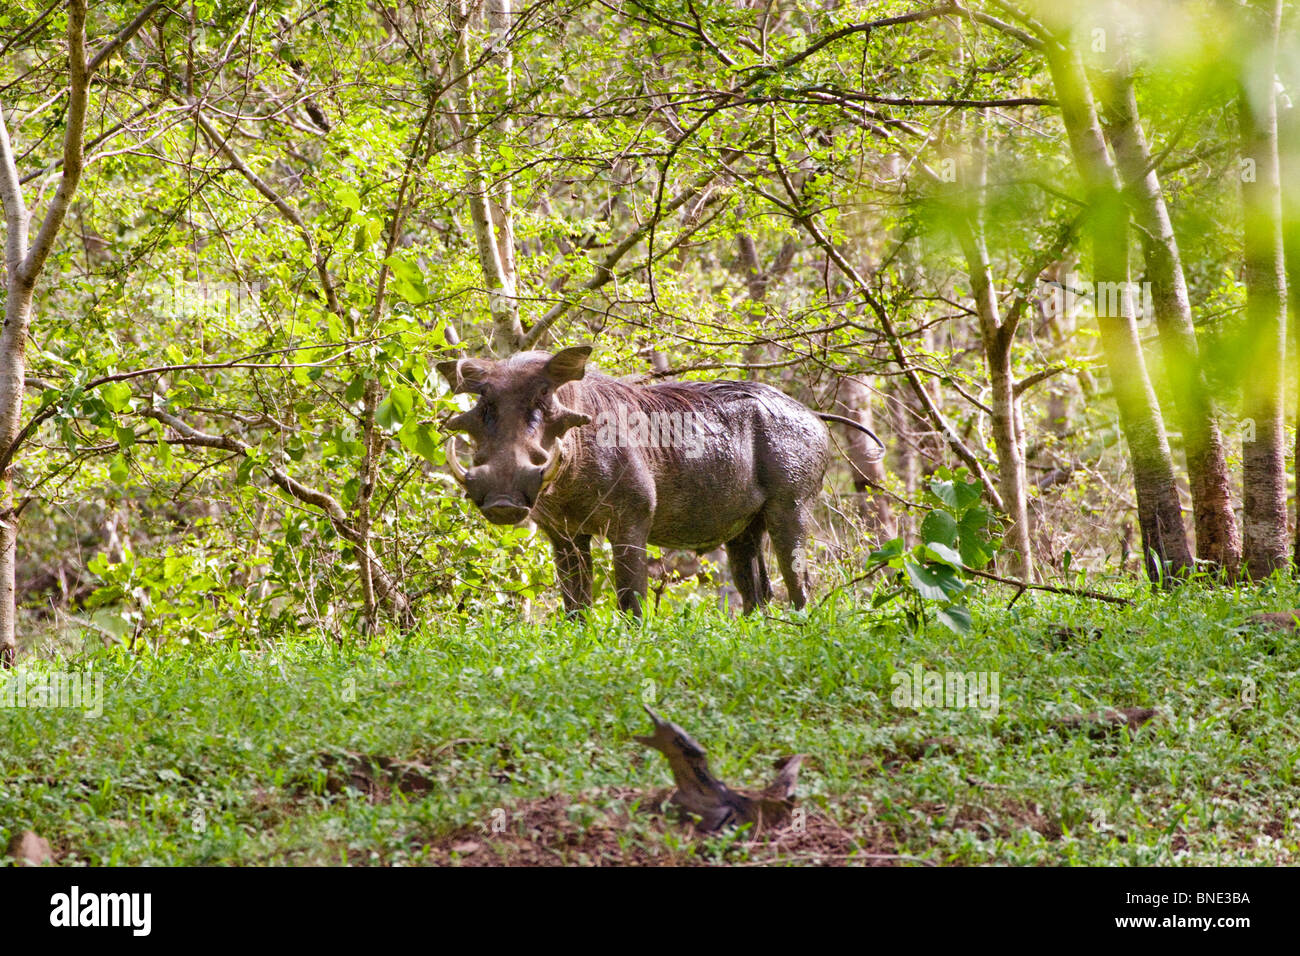 Common Warthog, Phacochoerus africanus, in Mole National Park, Ghana. - Stock Image